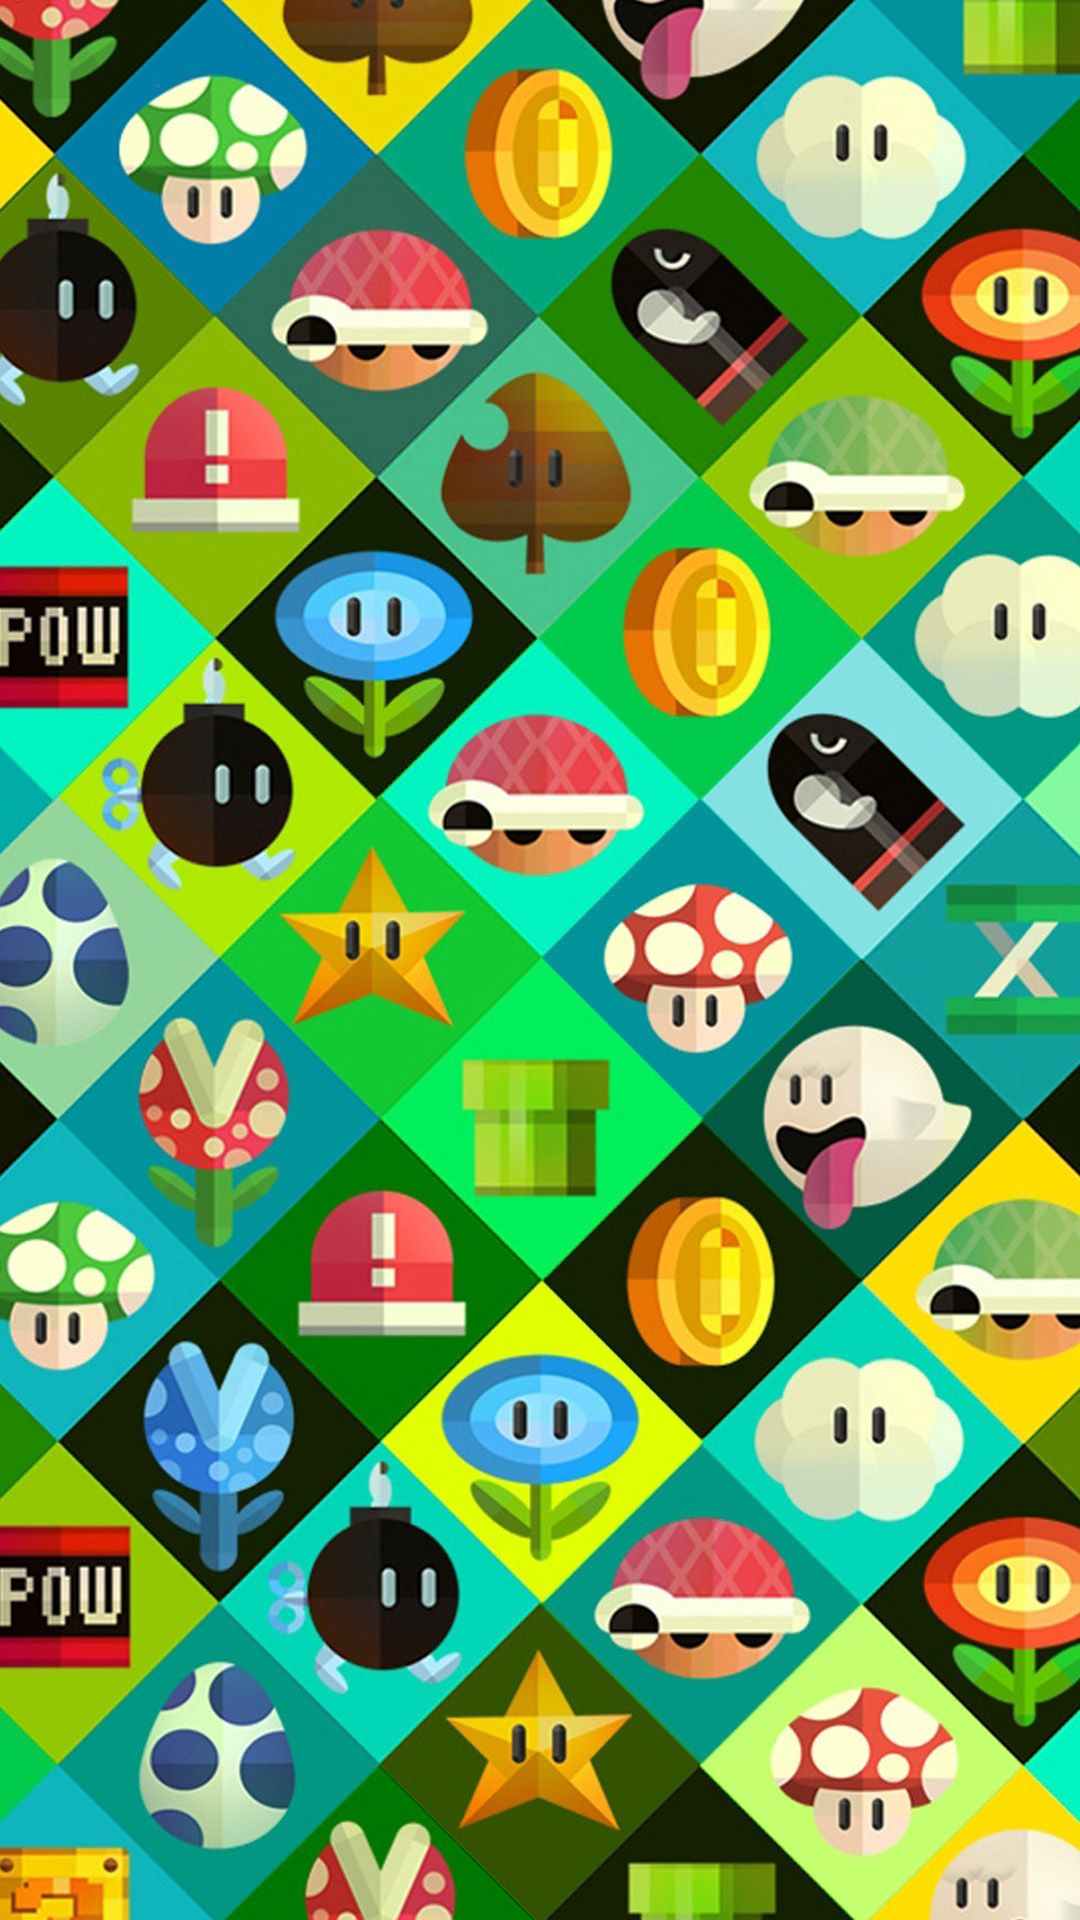 App Icon Design Iphone 6 Plus Wallpapers Iphone 6 Plus Wallpaper Mario Bros Mario Art Super Mario Bros